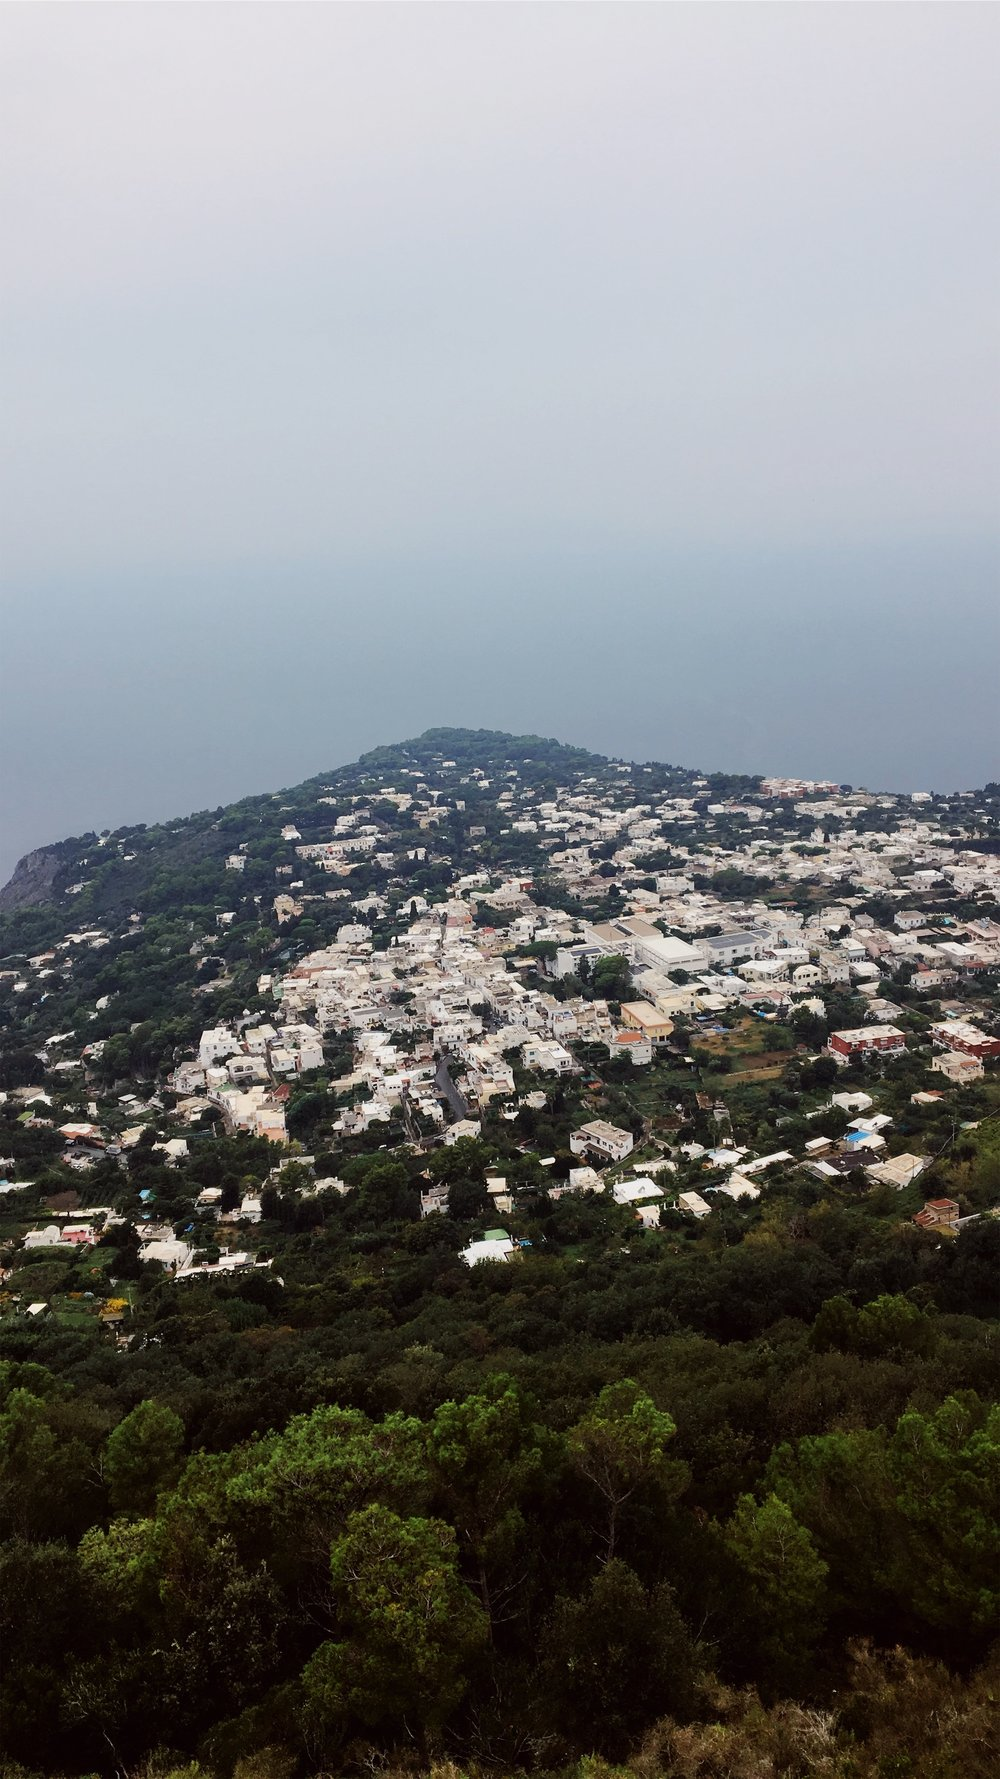 Monte Salaro Chairlift (Taken at 1,932 ft the highest point of Capri, Italy)